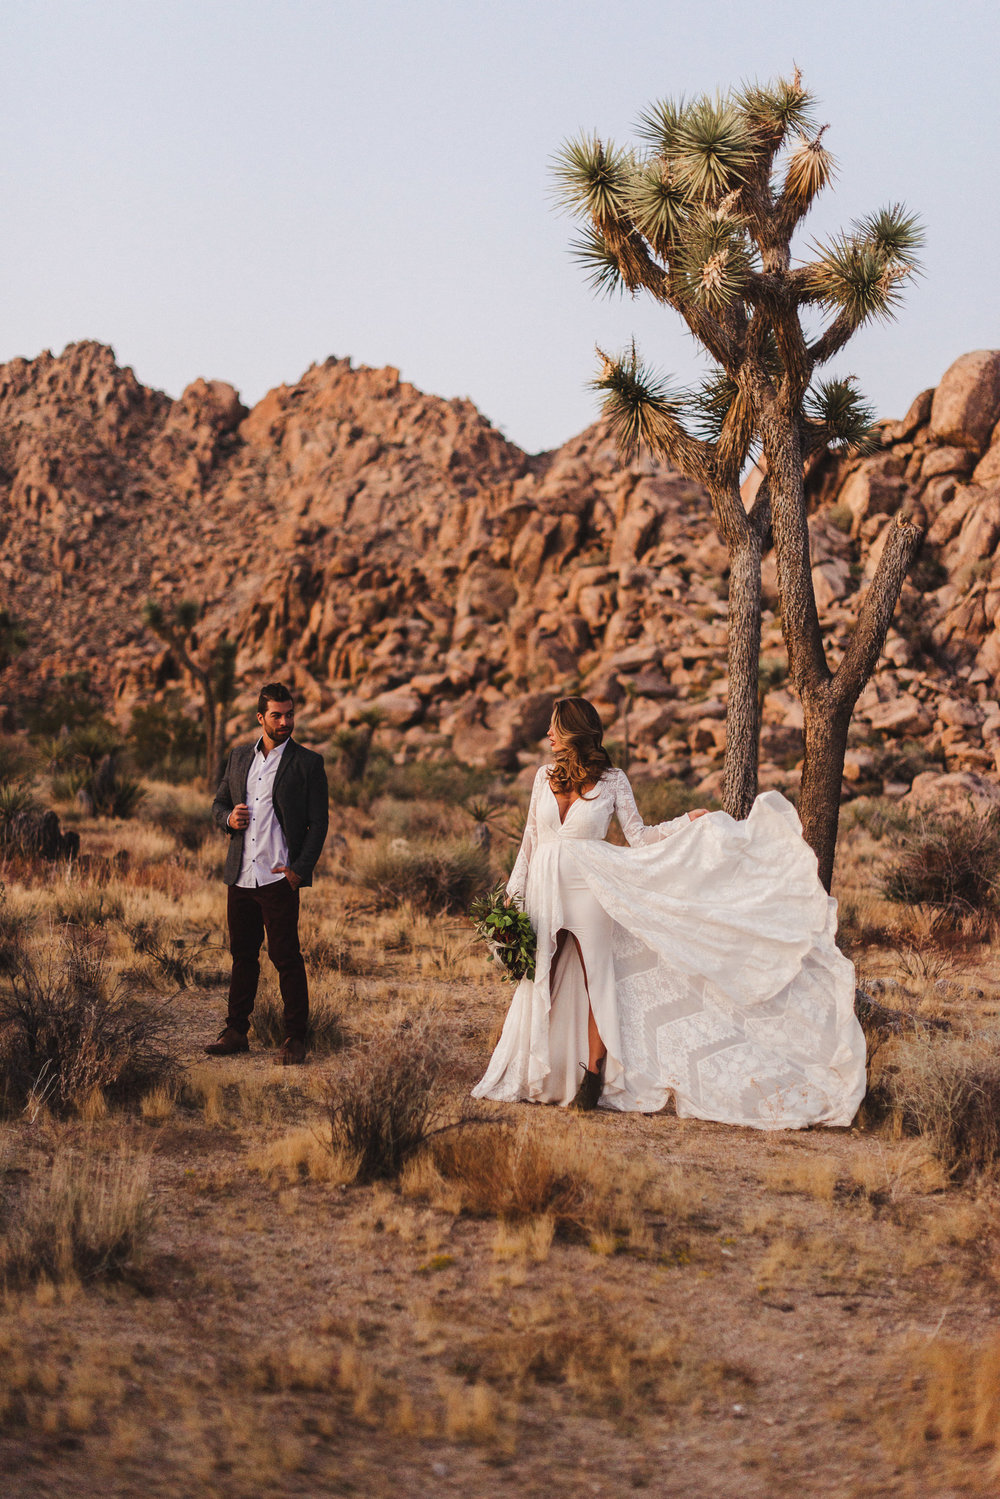 sMagdalena + Yoan - Elopement, Joshua Tree CA-171.jpg